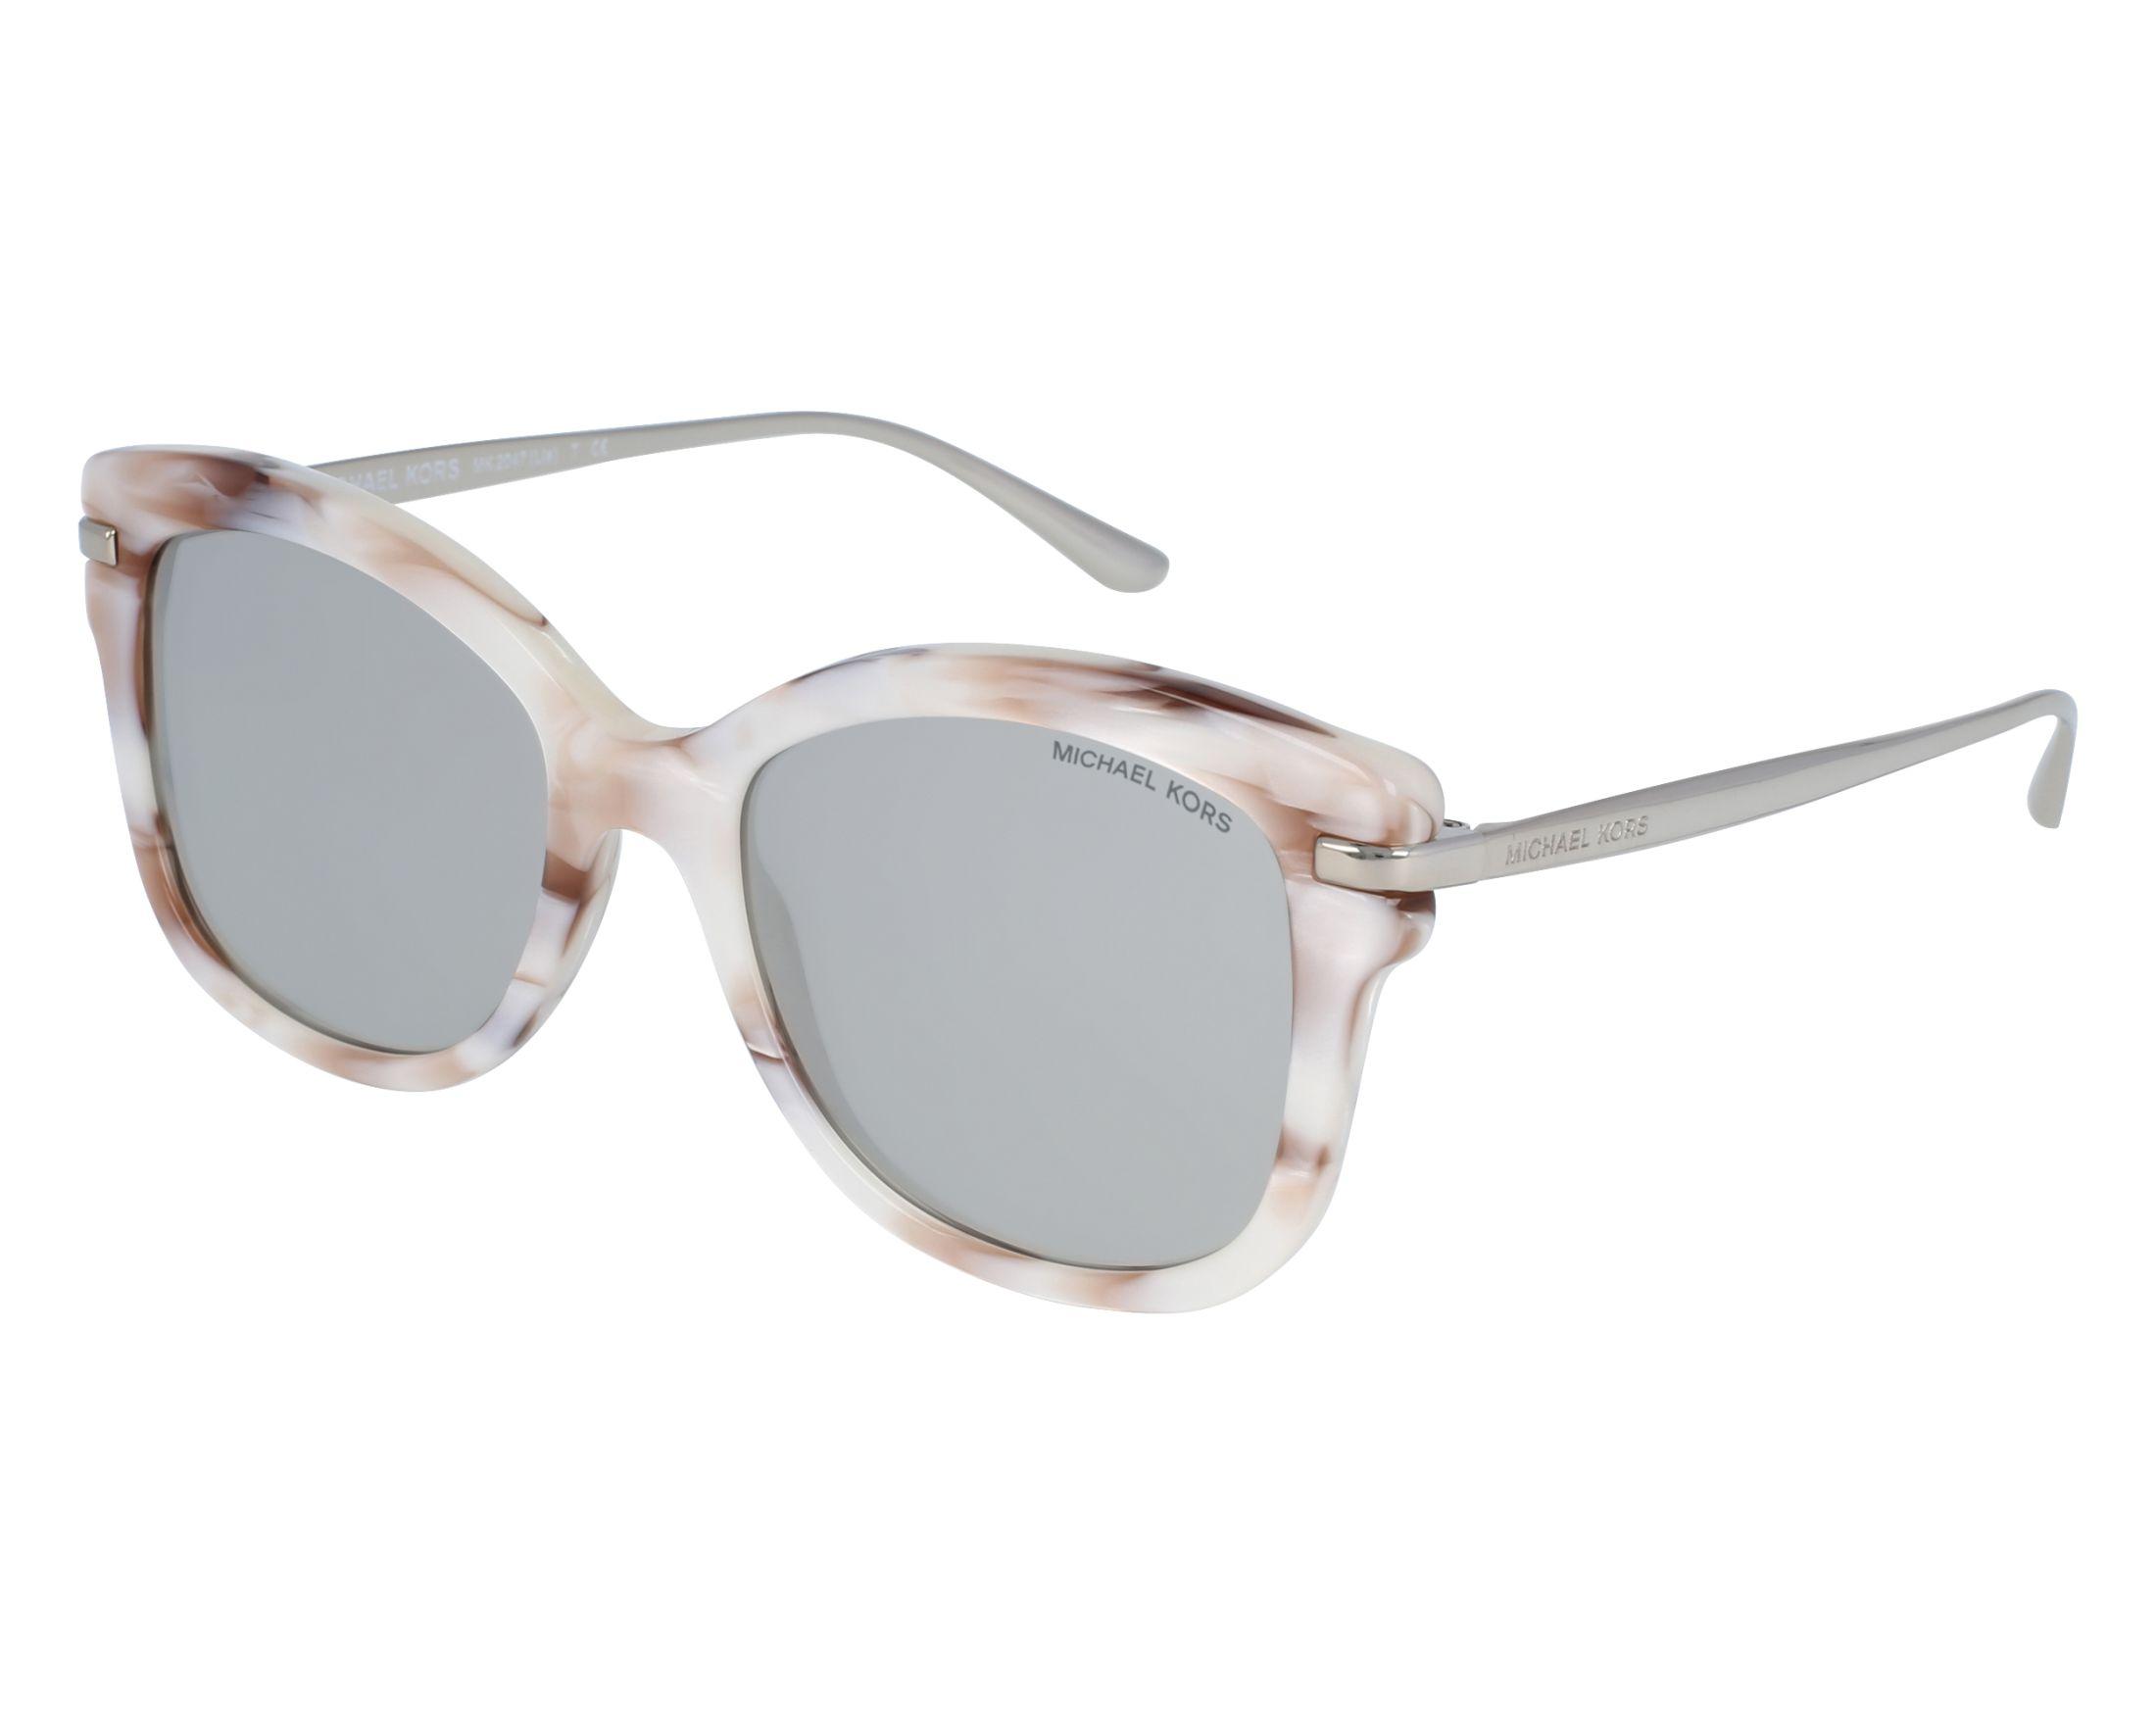 5a0716e72d Sunglasses Michael Kors MK-2047 32486G 53-18 White Brown front view